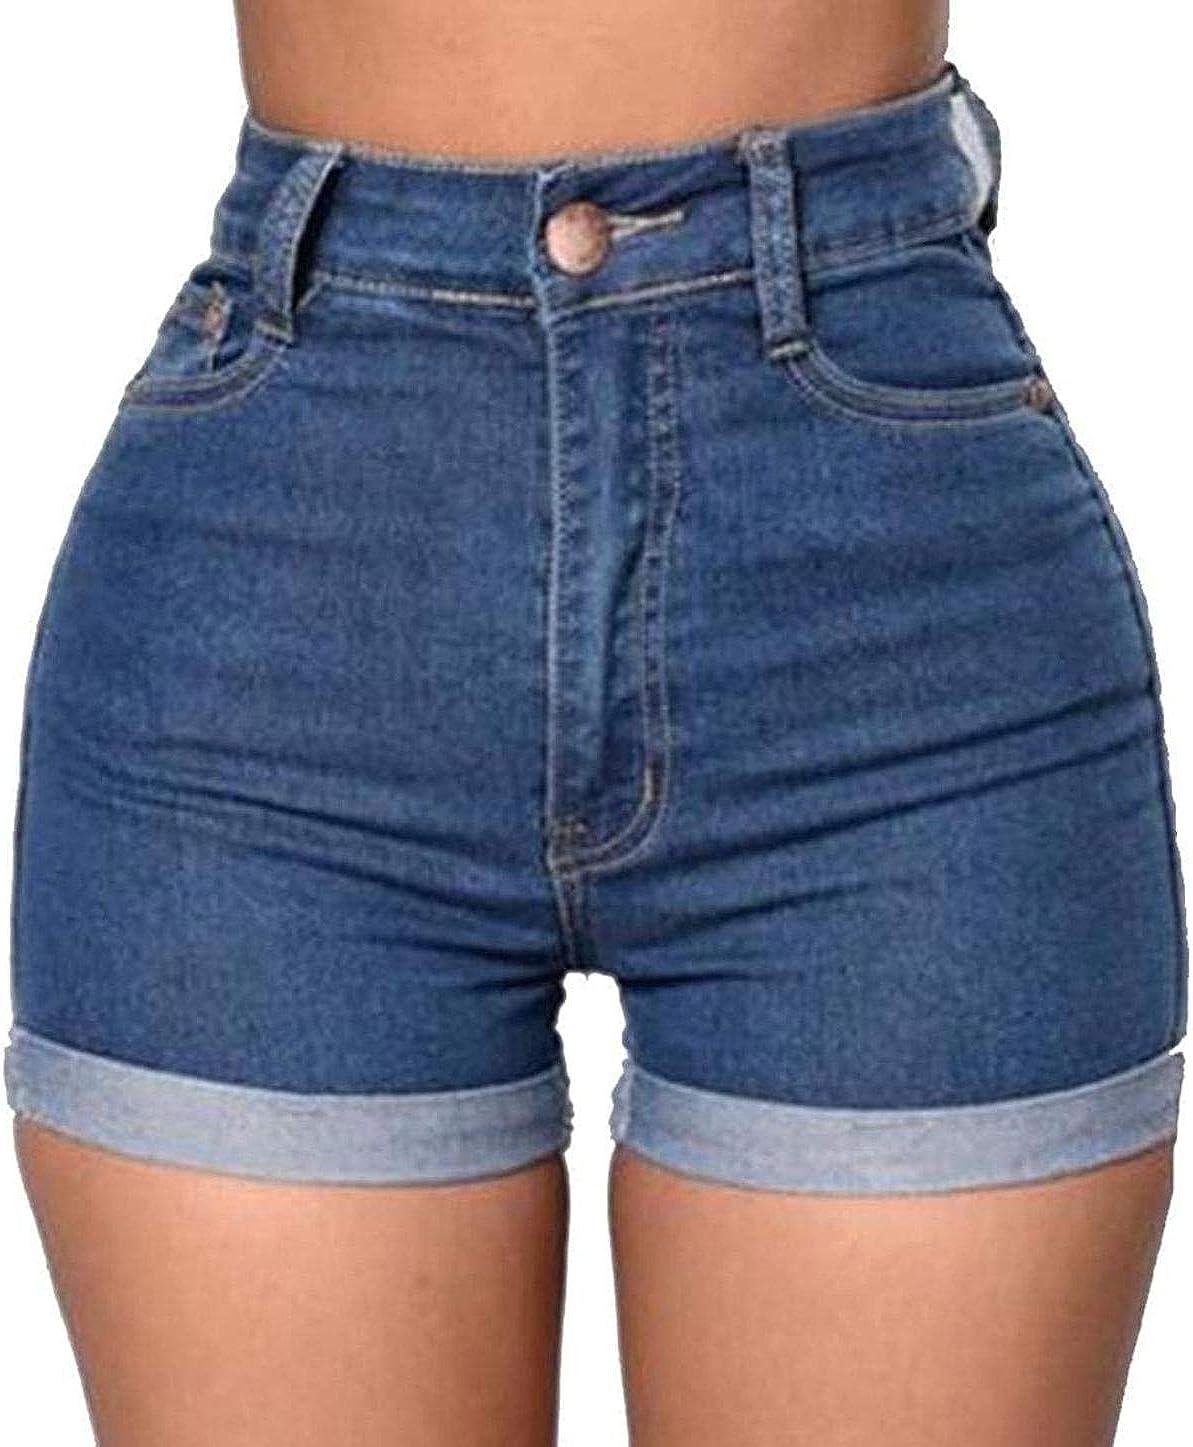 Womens Juniors Vintage Denim High Waisted Folded Hem Jeans Short